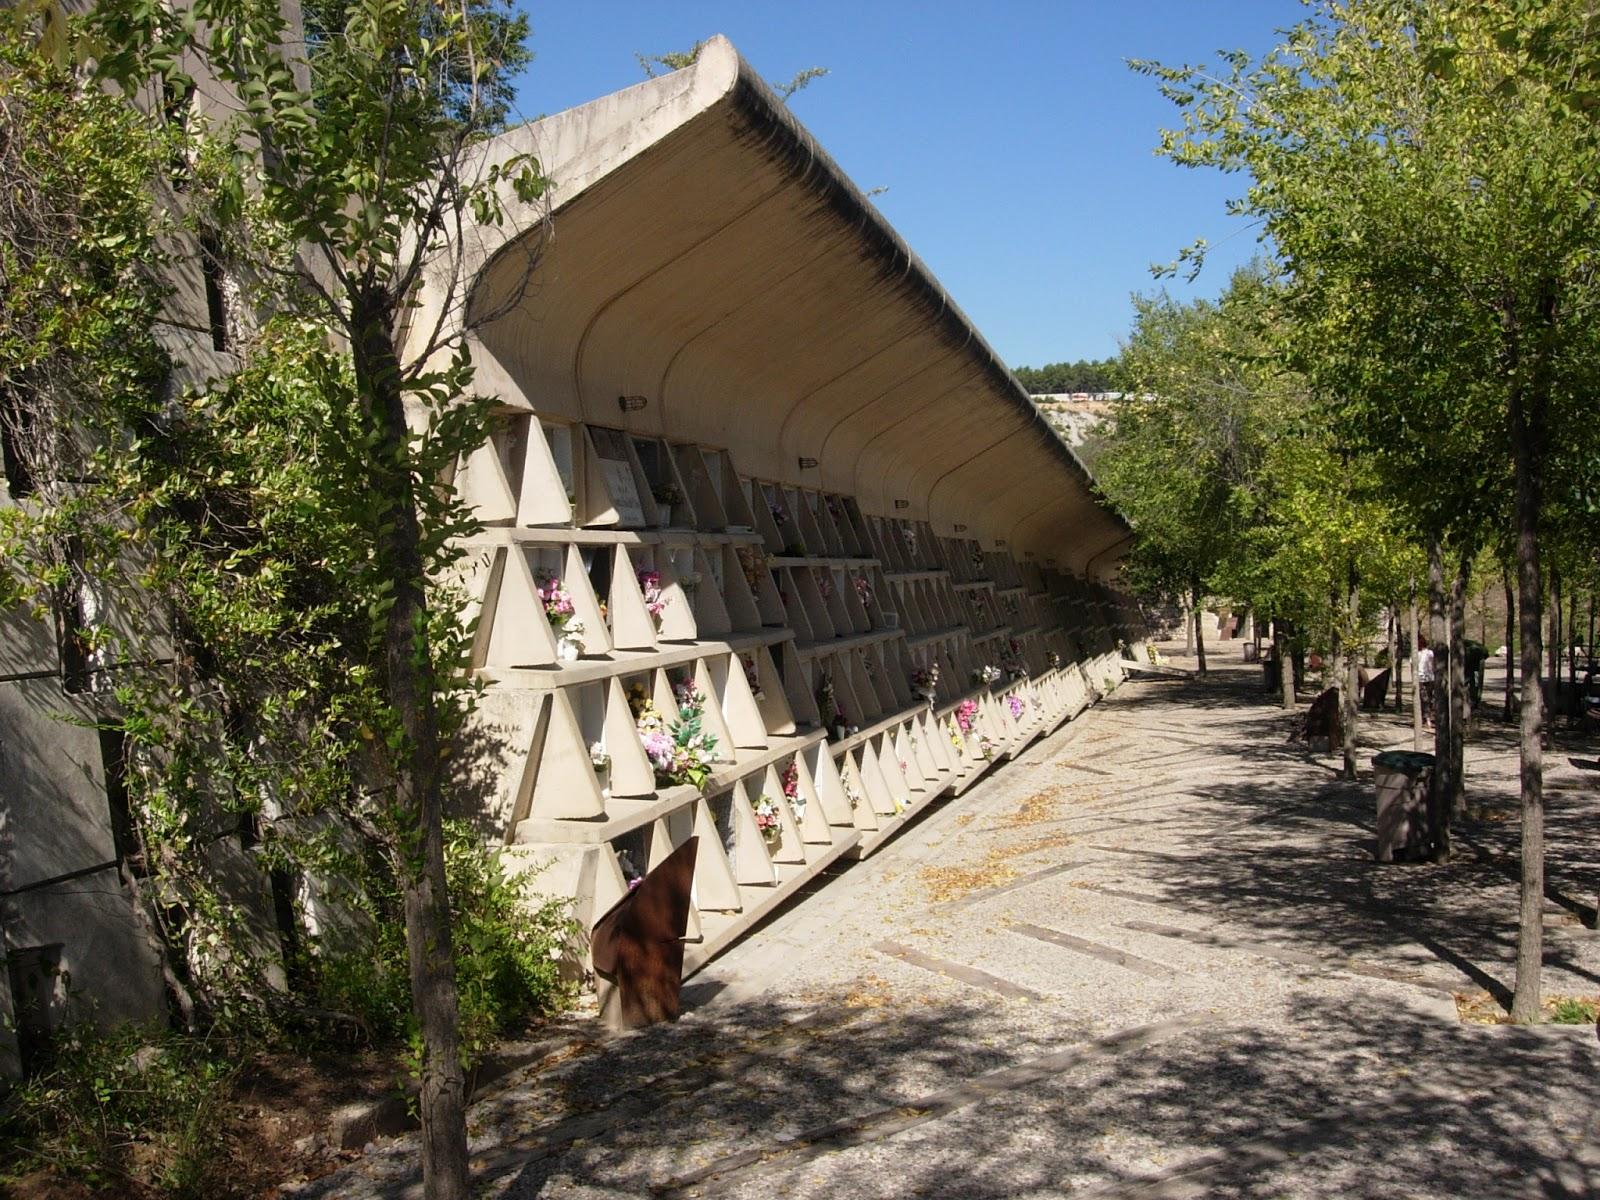 Blog de phaco ambitieuses r alisations d 39 enric mirall s architecte catalan - Architekt barcelona ...